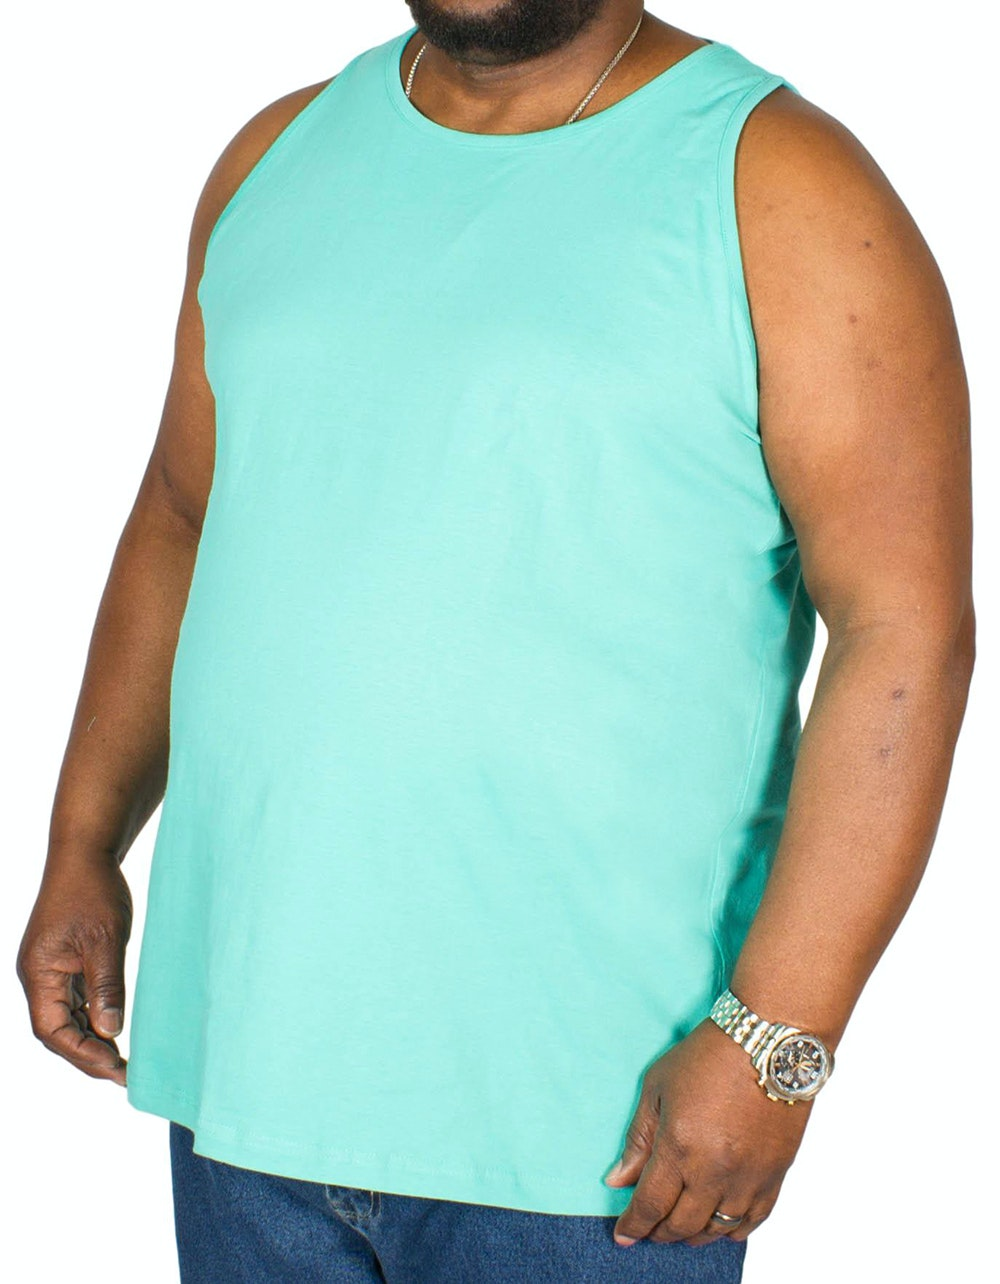 Bigdude Plain Vest Turquoise